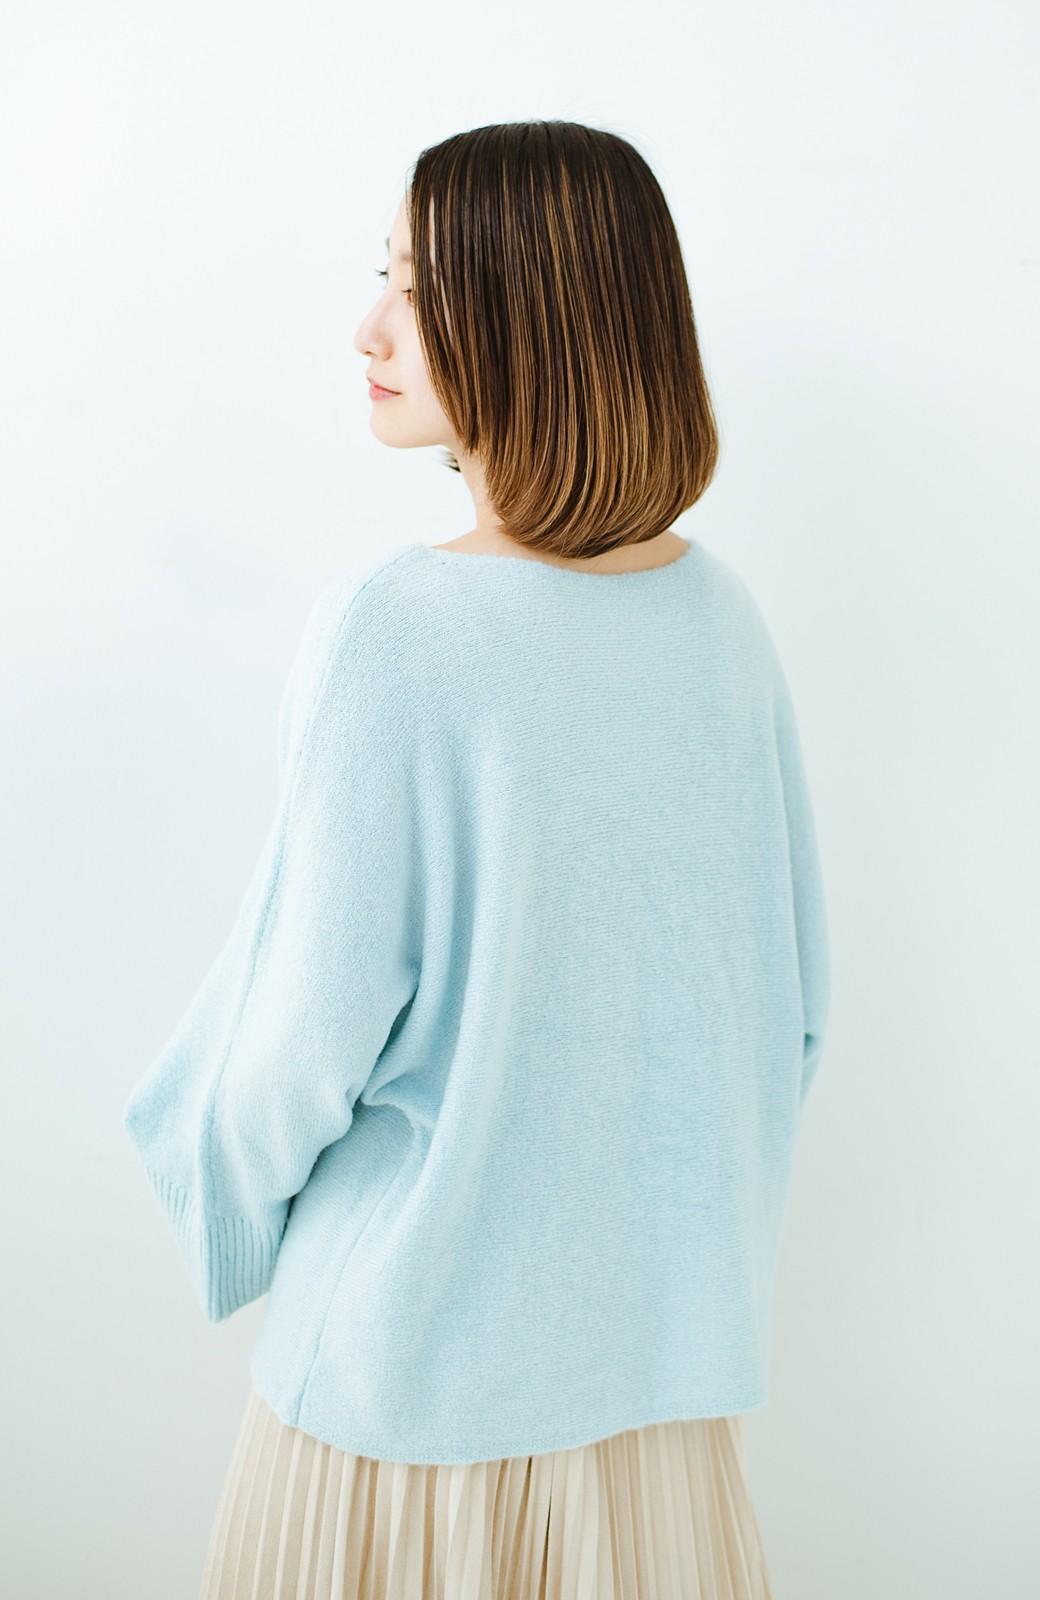 haco! 太め袖がかわいい横編みプルオーバーニット <ライトブルー>の商品写真17